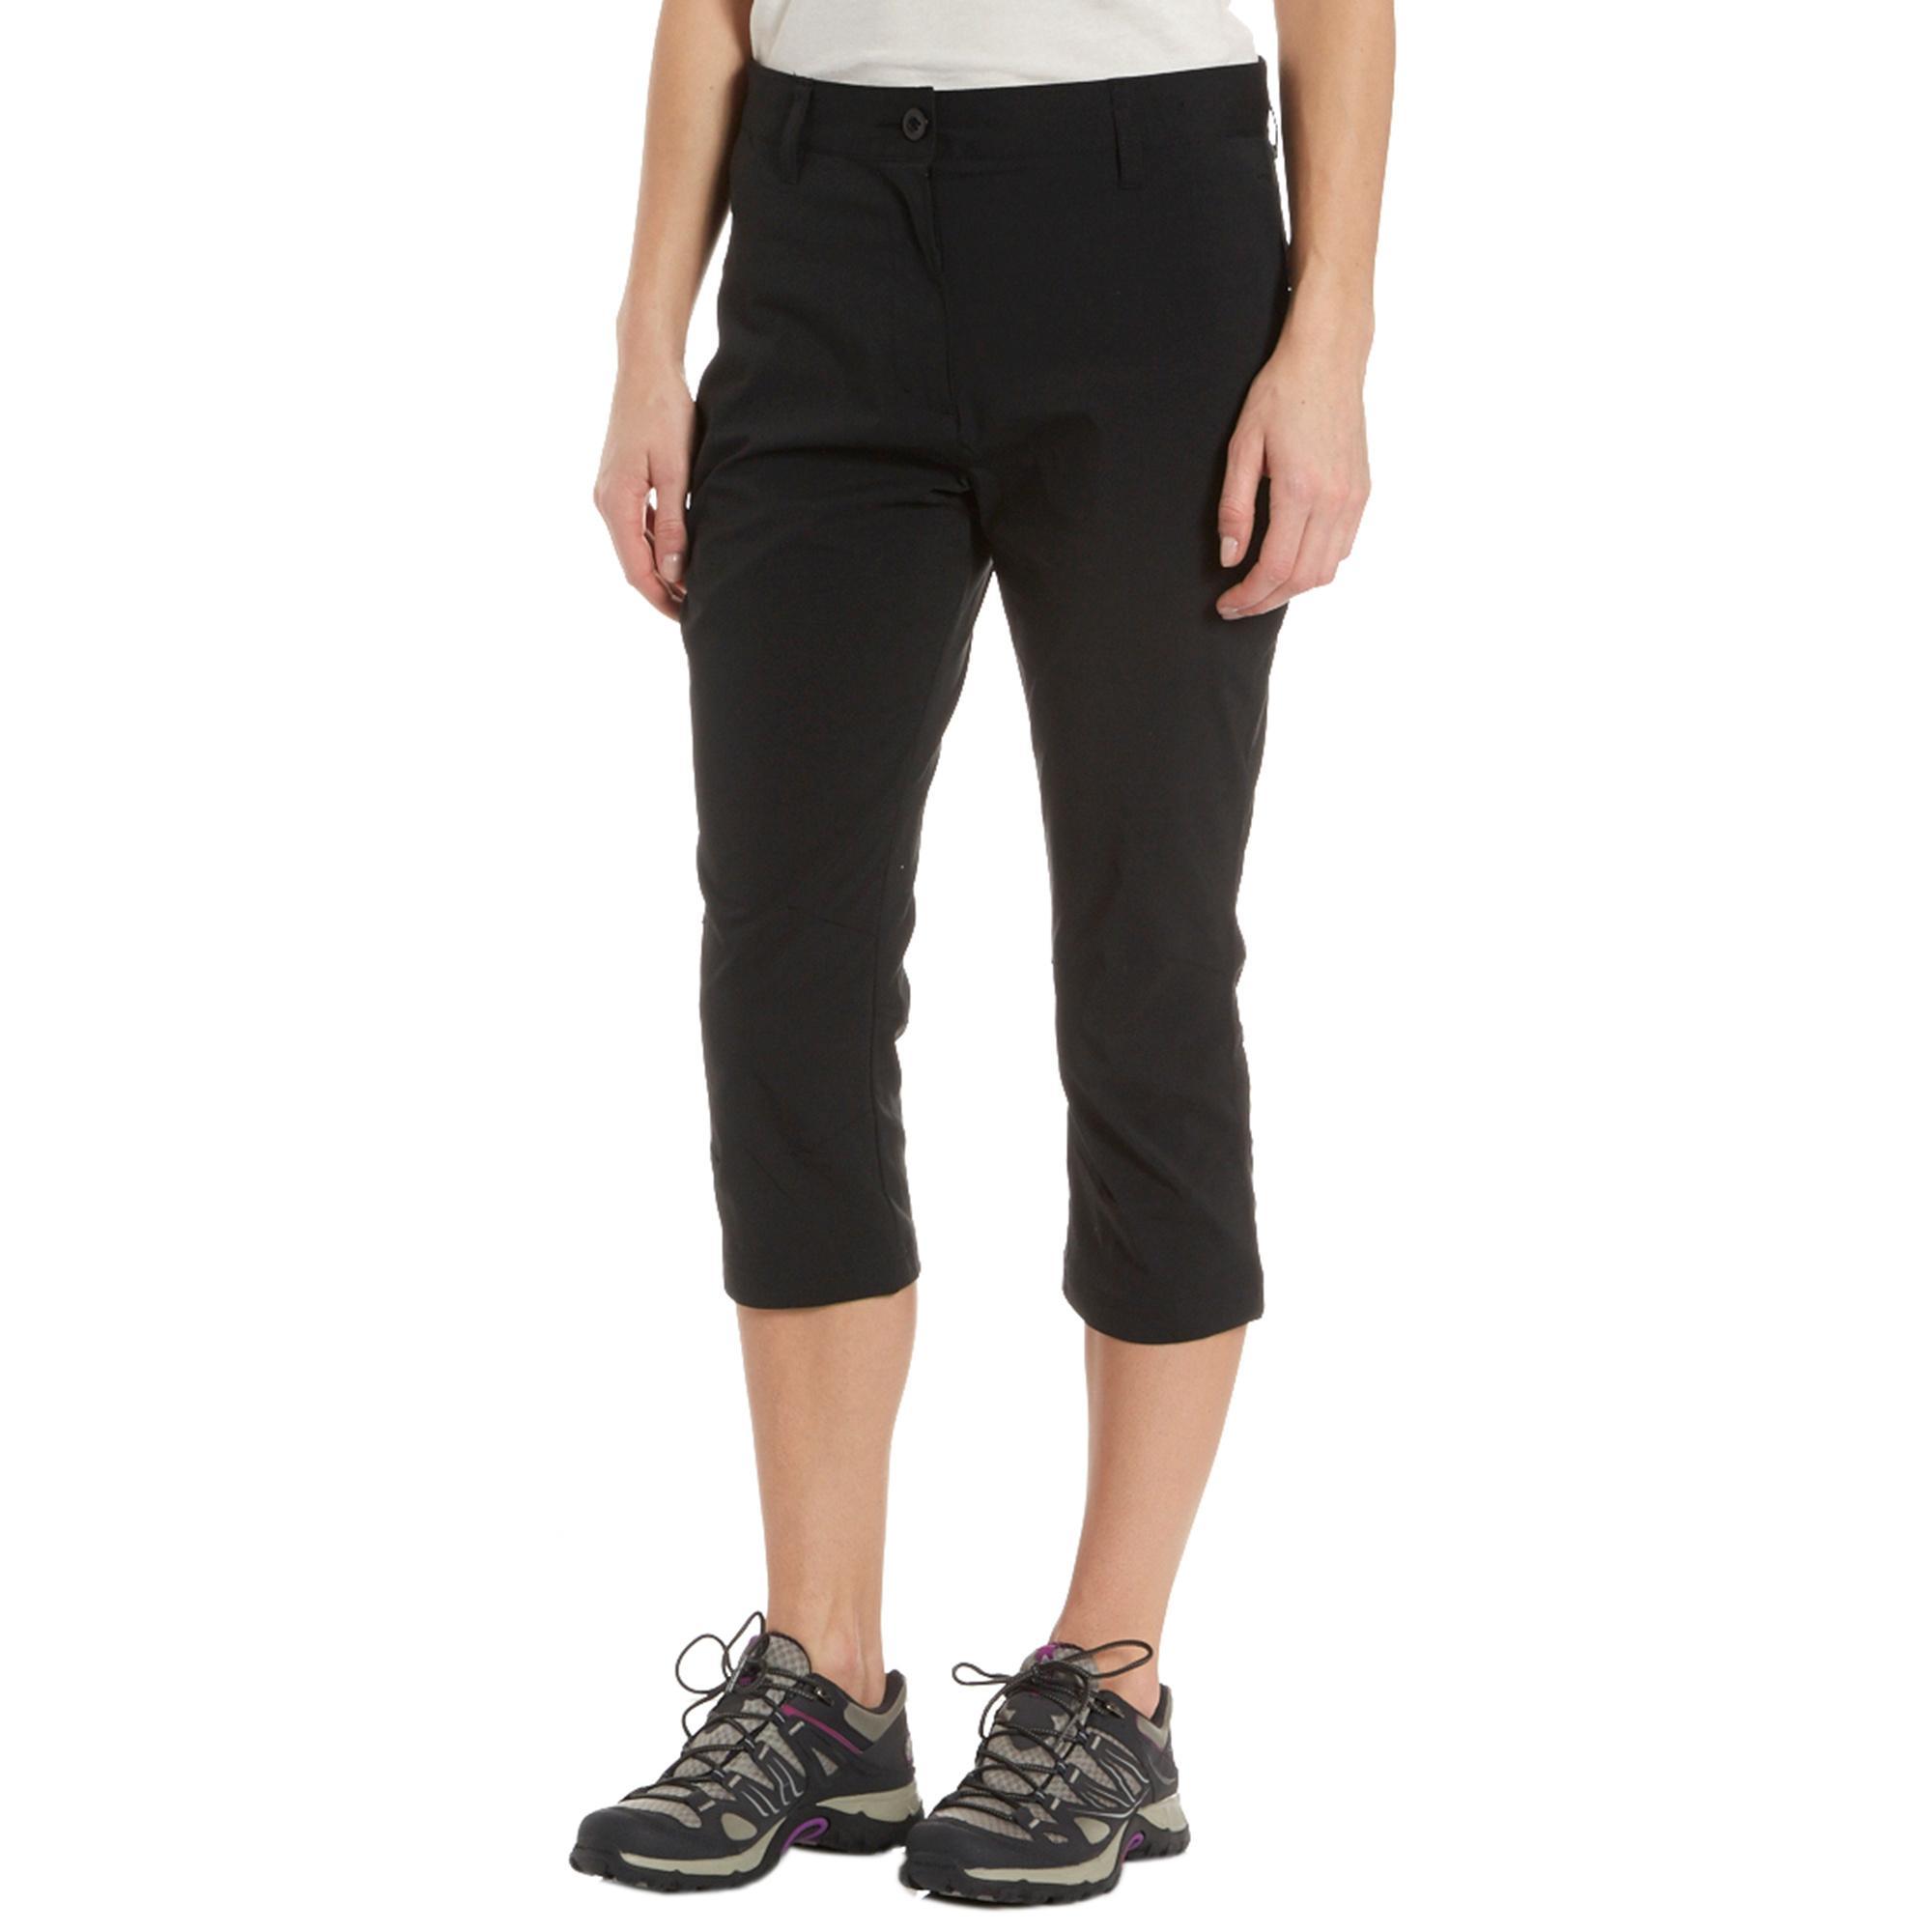 Peter Storm Women's Stretch Capris, Black